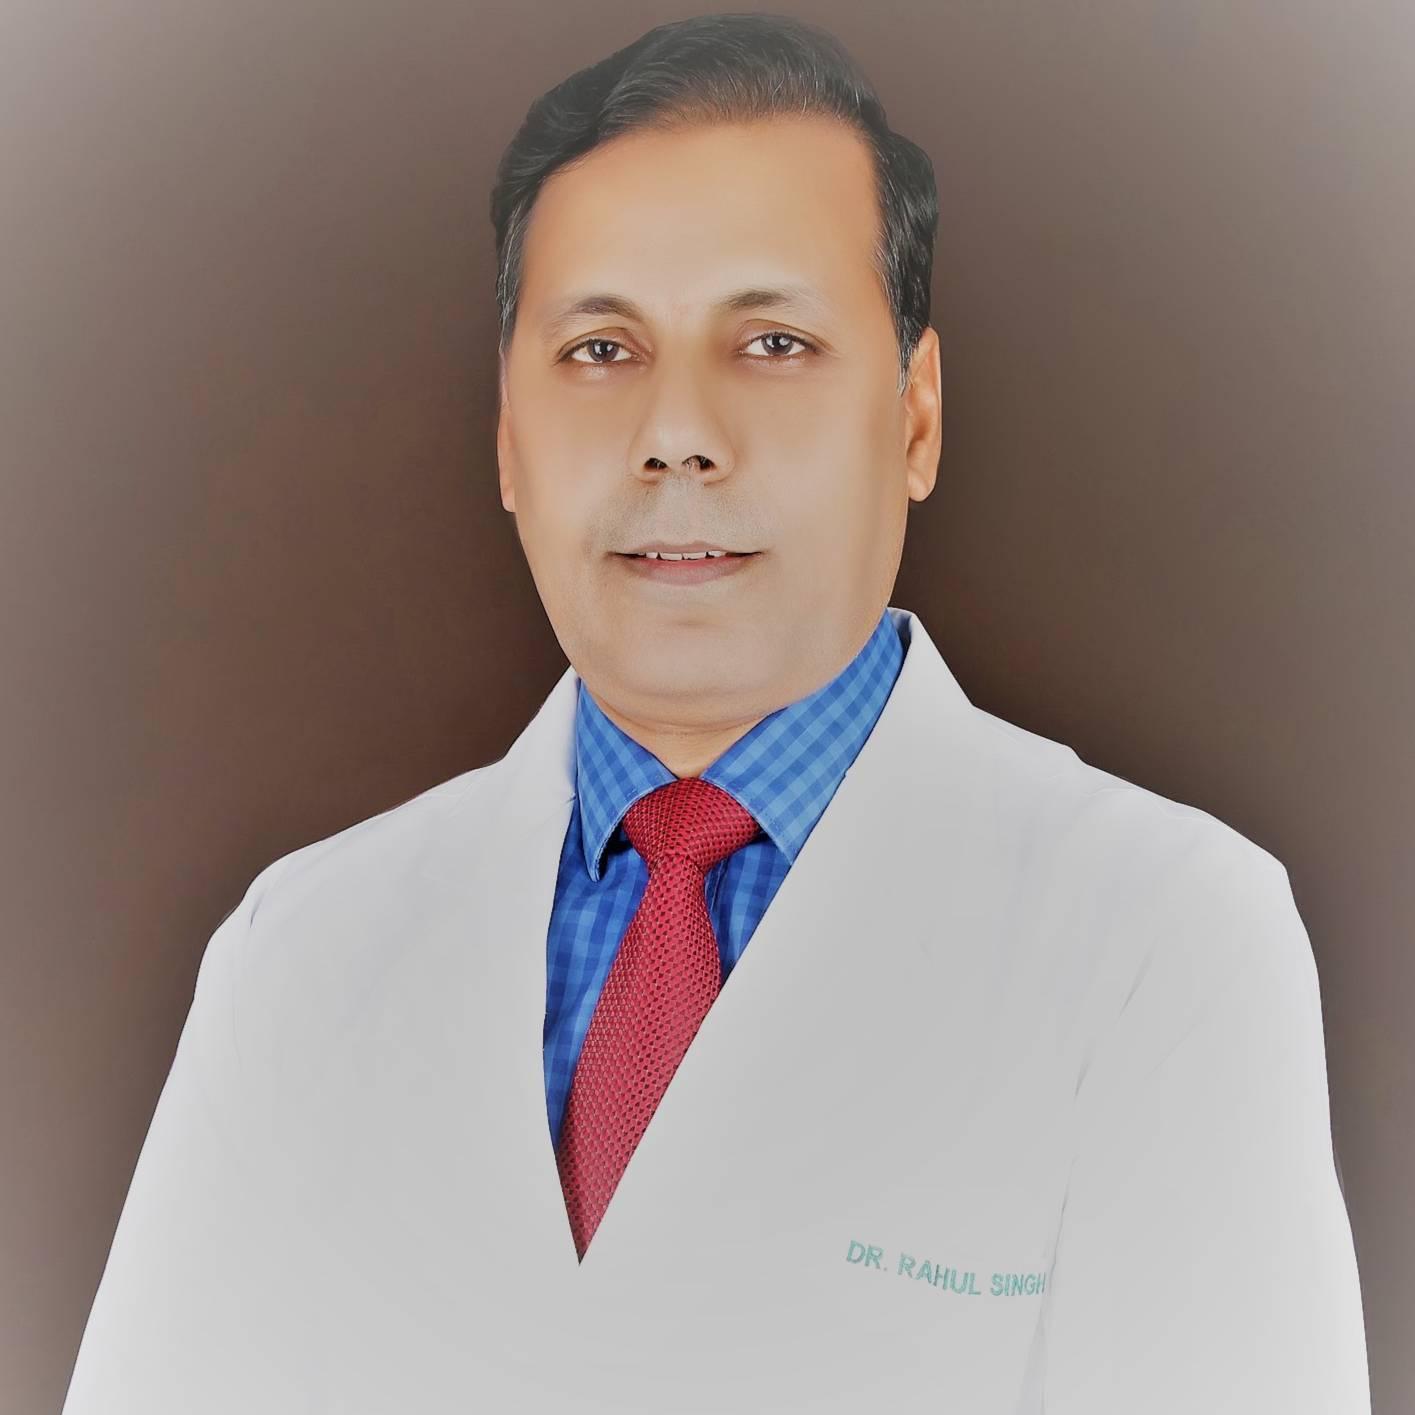 Dr. Rahul Singhal